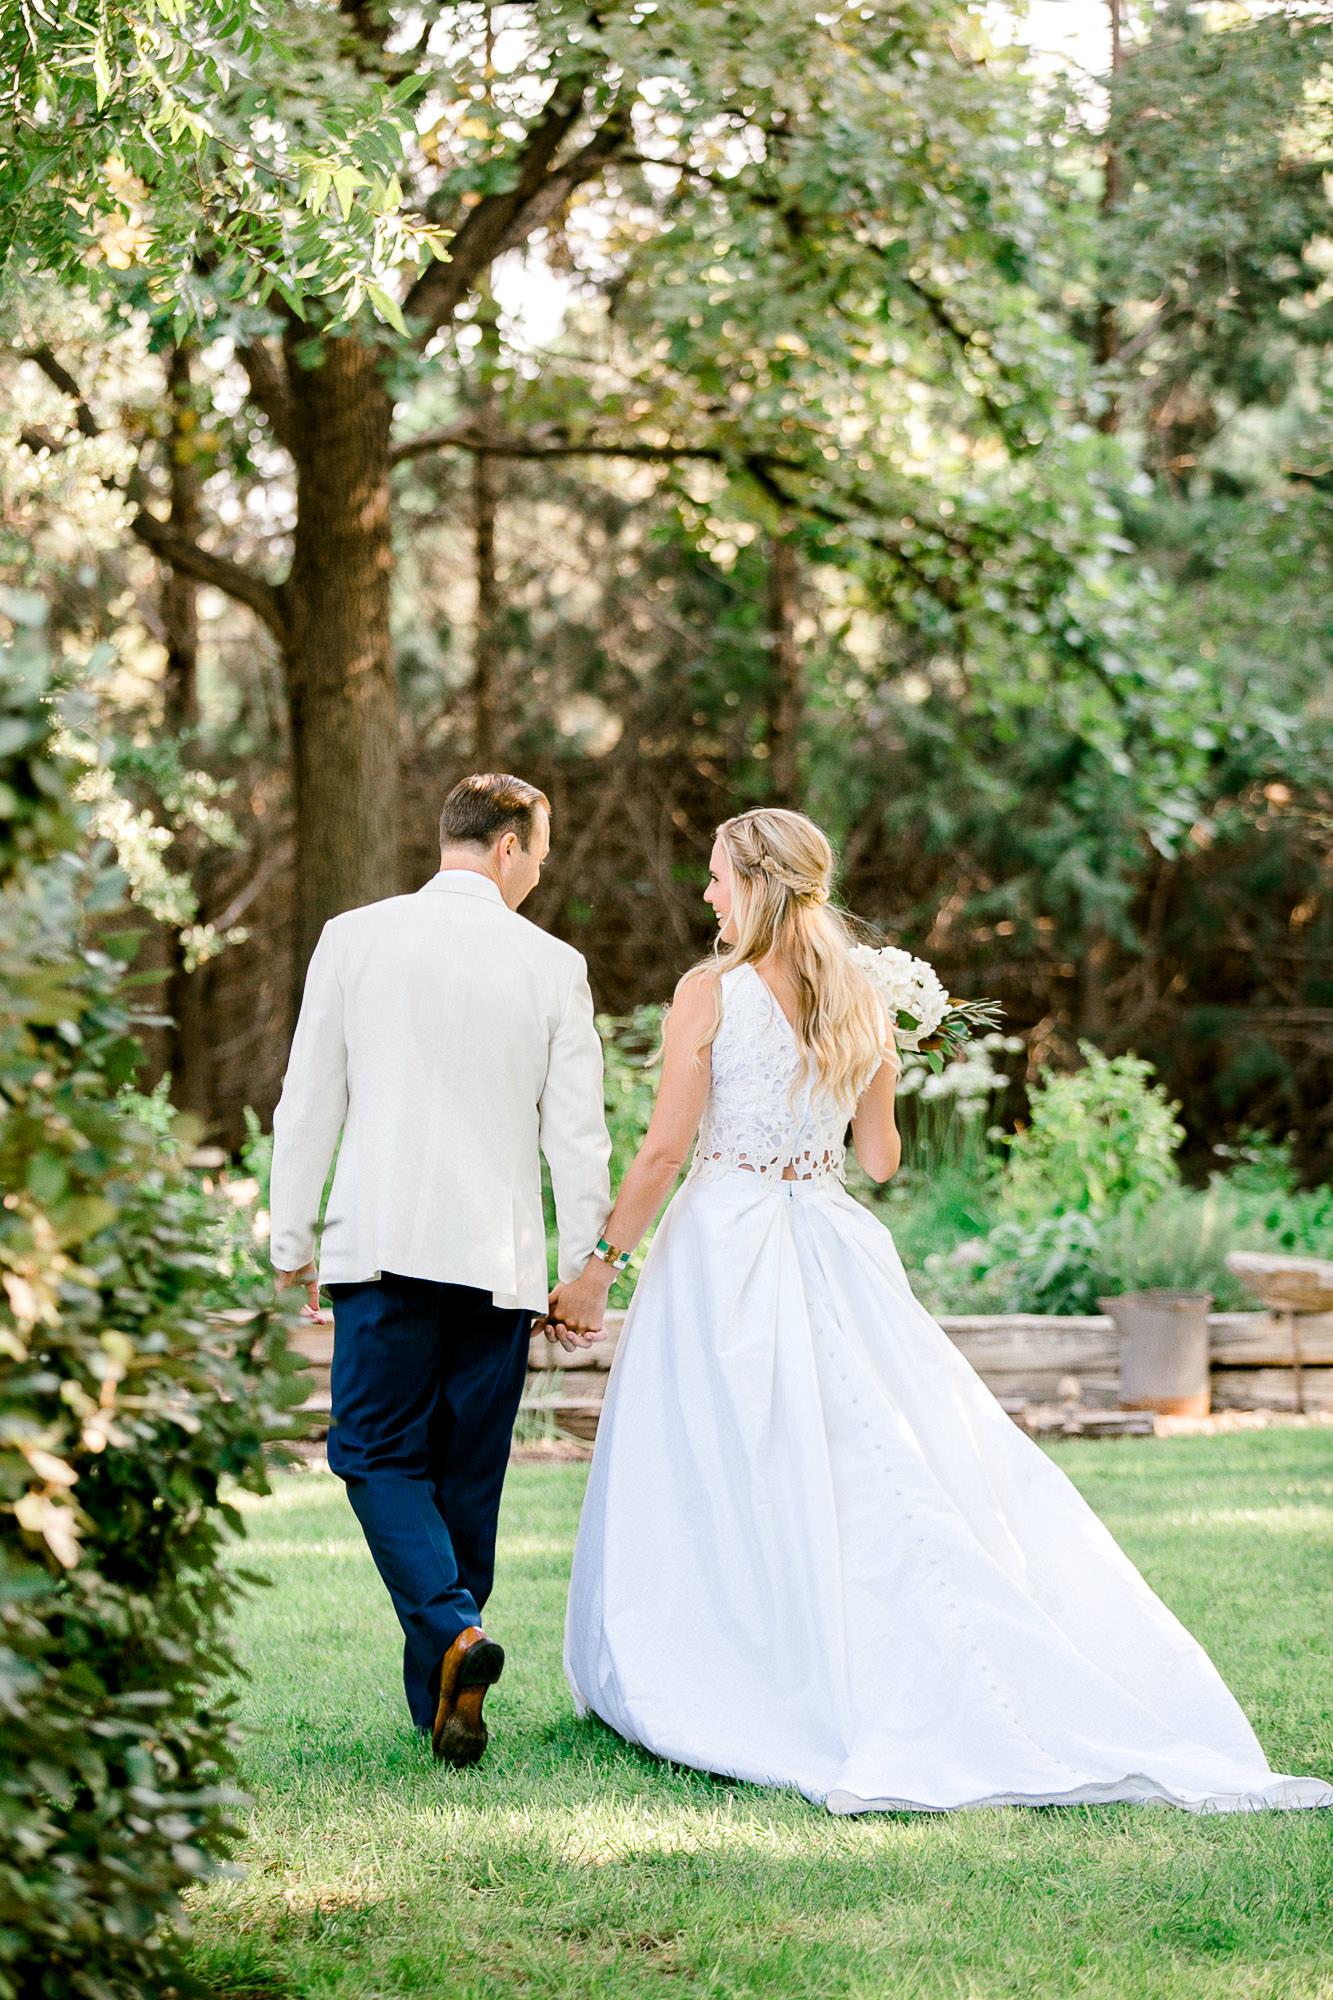 ali-brandon-hamilton-lubbock-wedding-photographer-estate-lee-lewis-construction-bee-alleej_0066.jpg